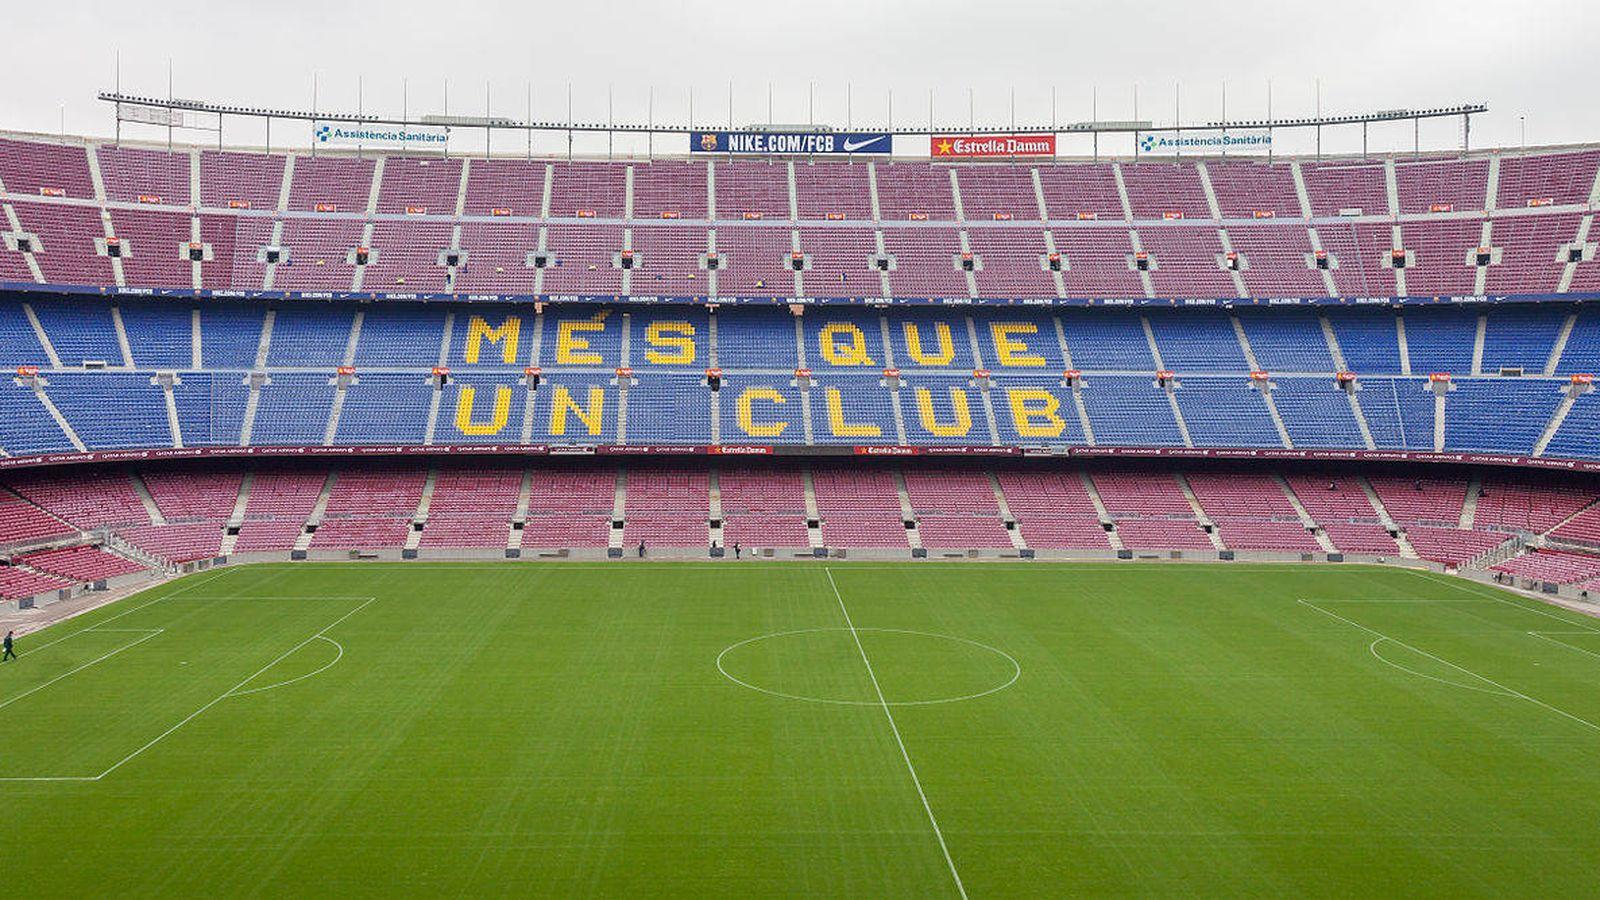 Foto: Camp Nou. (Luis Miguel Bugallo Sánchez)